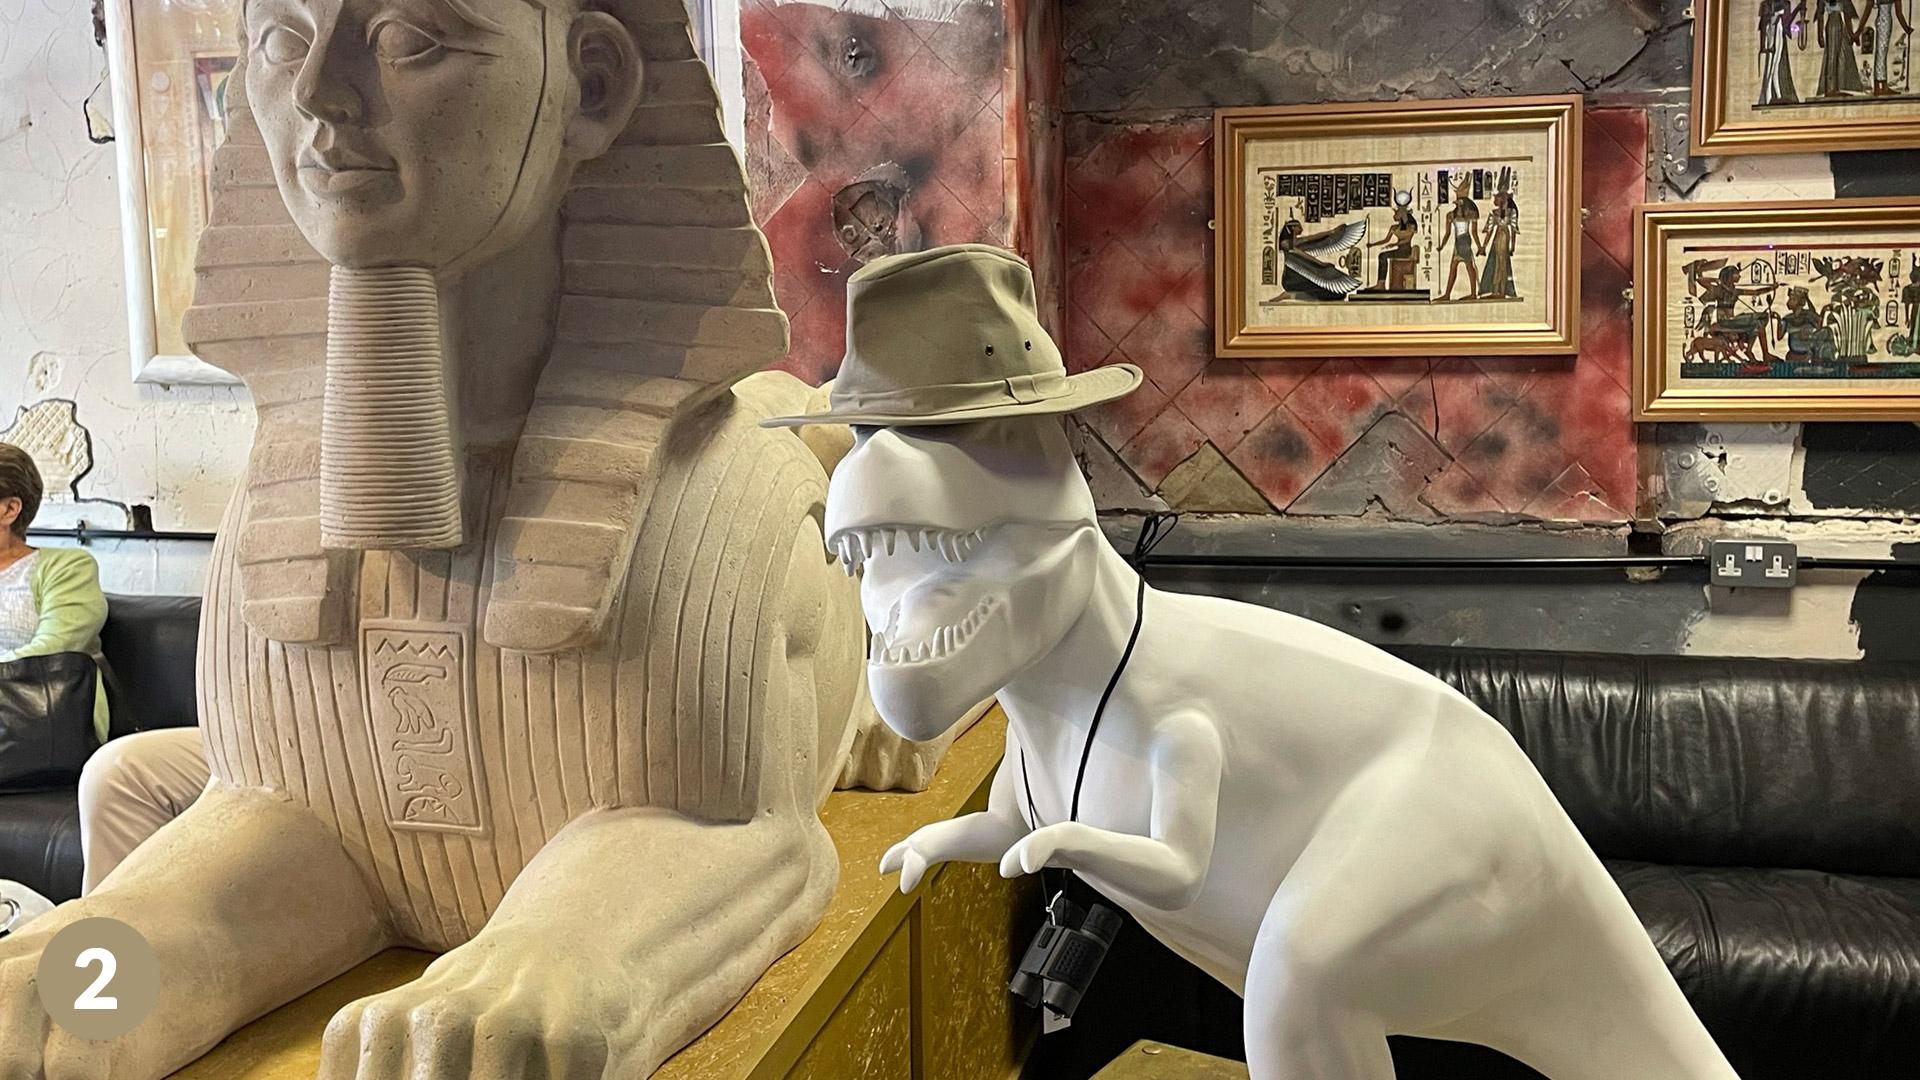 Dinosaur staue in hat